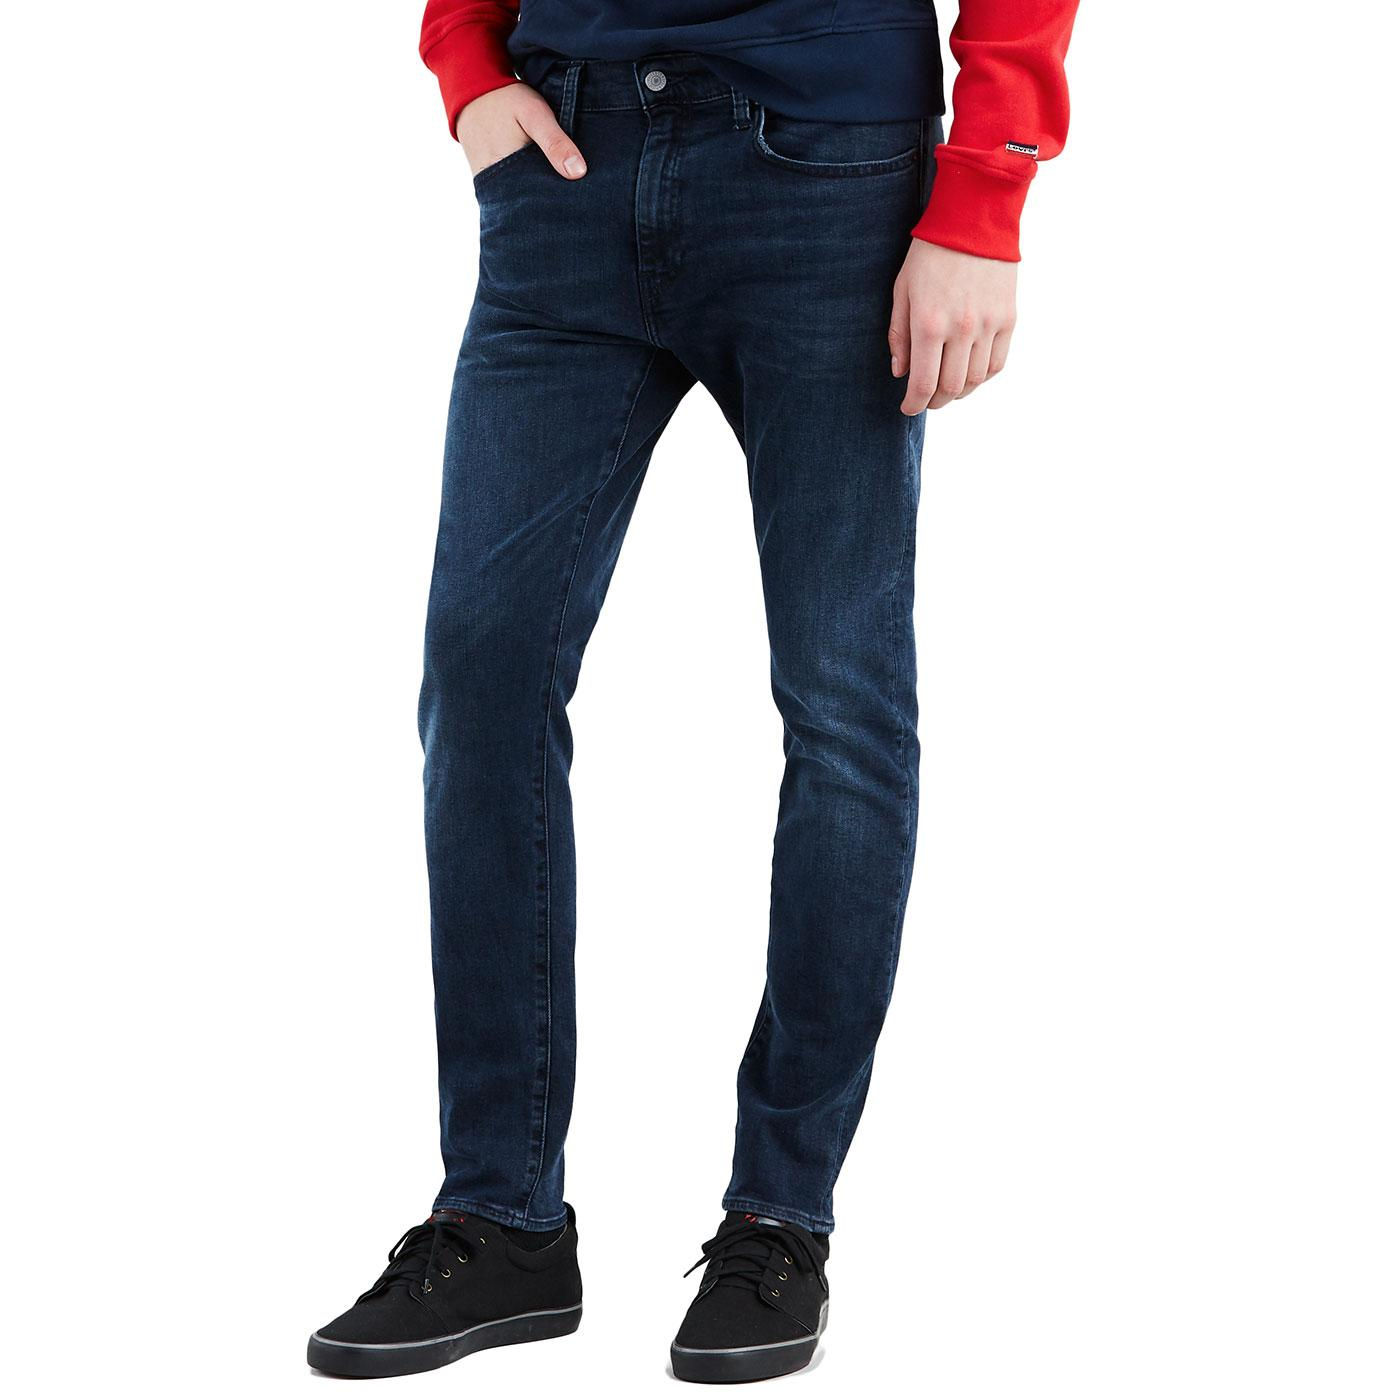 LEVI'S 512 Slim Taper Denim Jeans (Dark Blue)